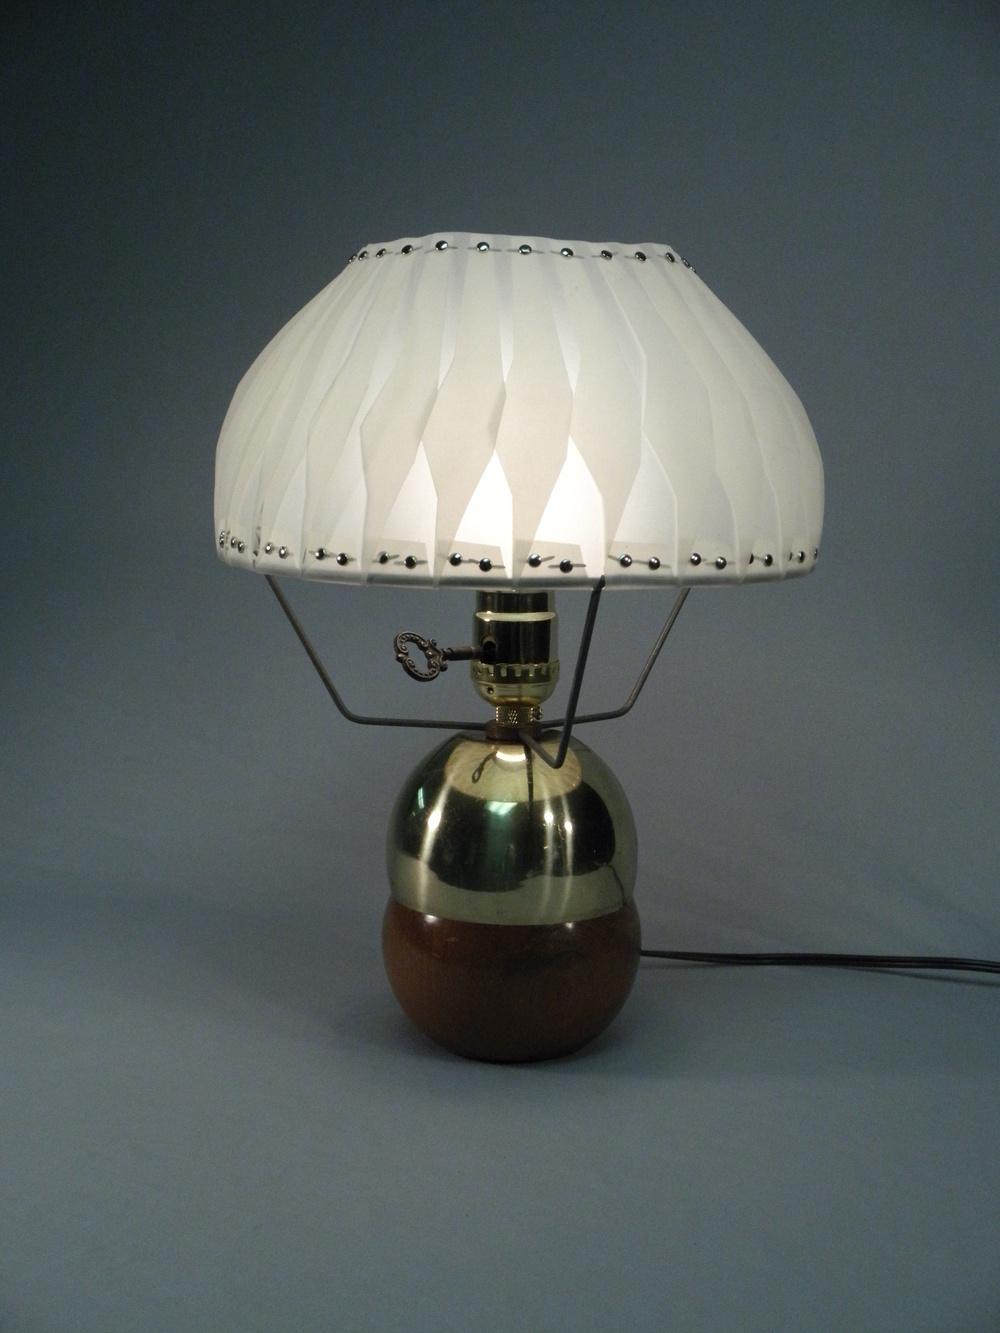 inventor_lamp.JPG